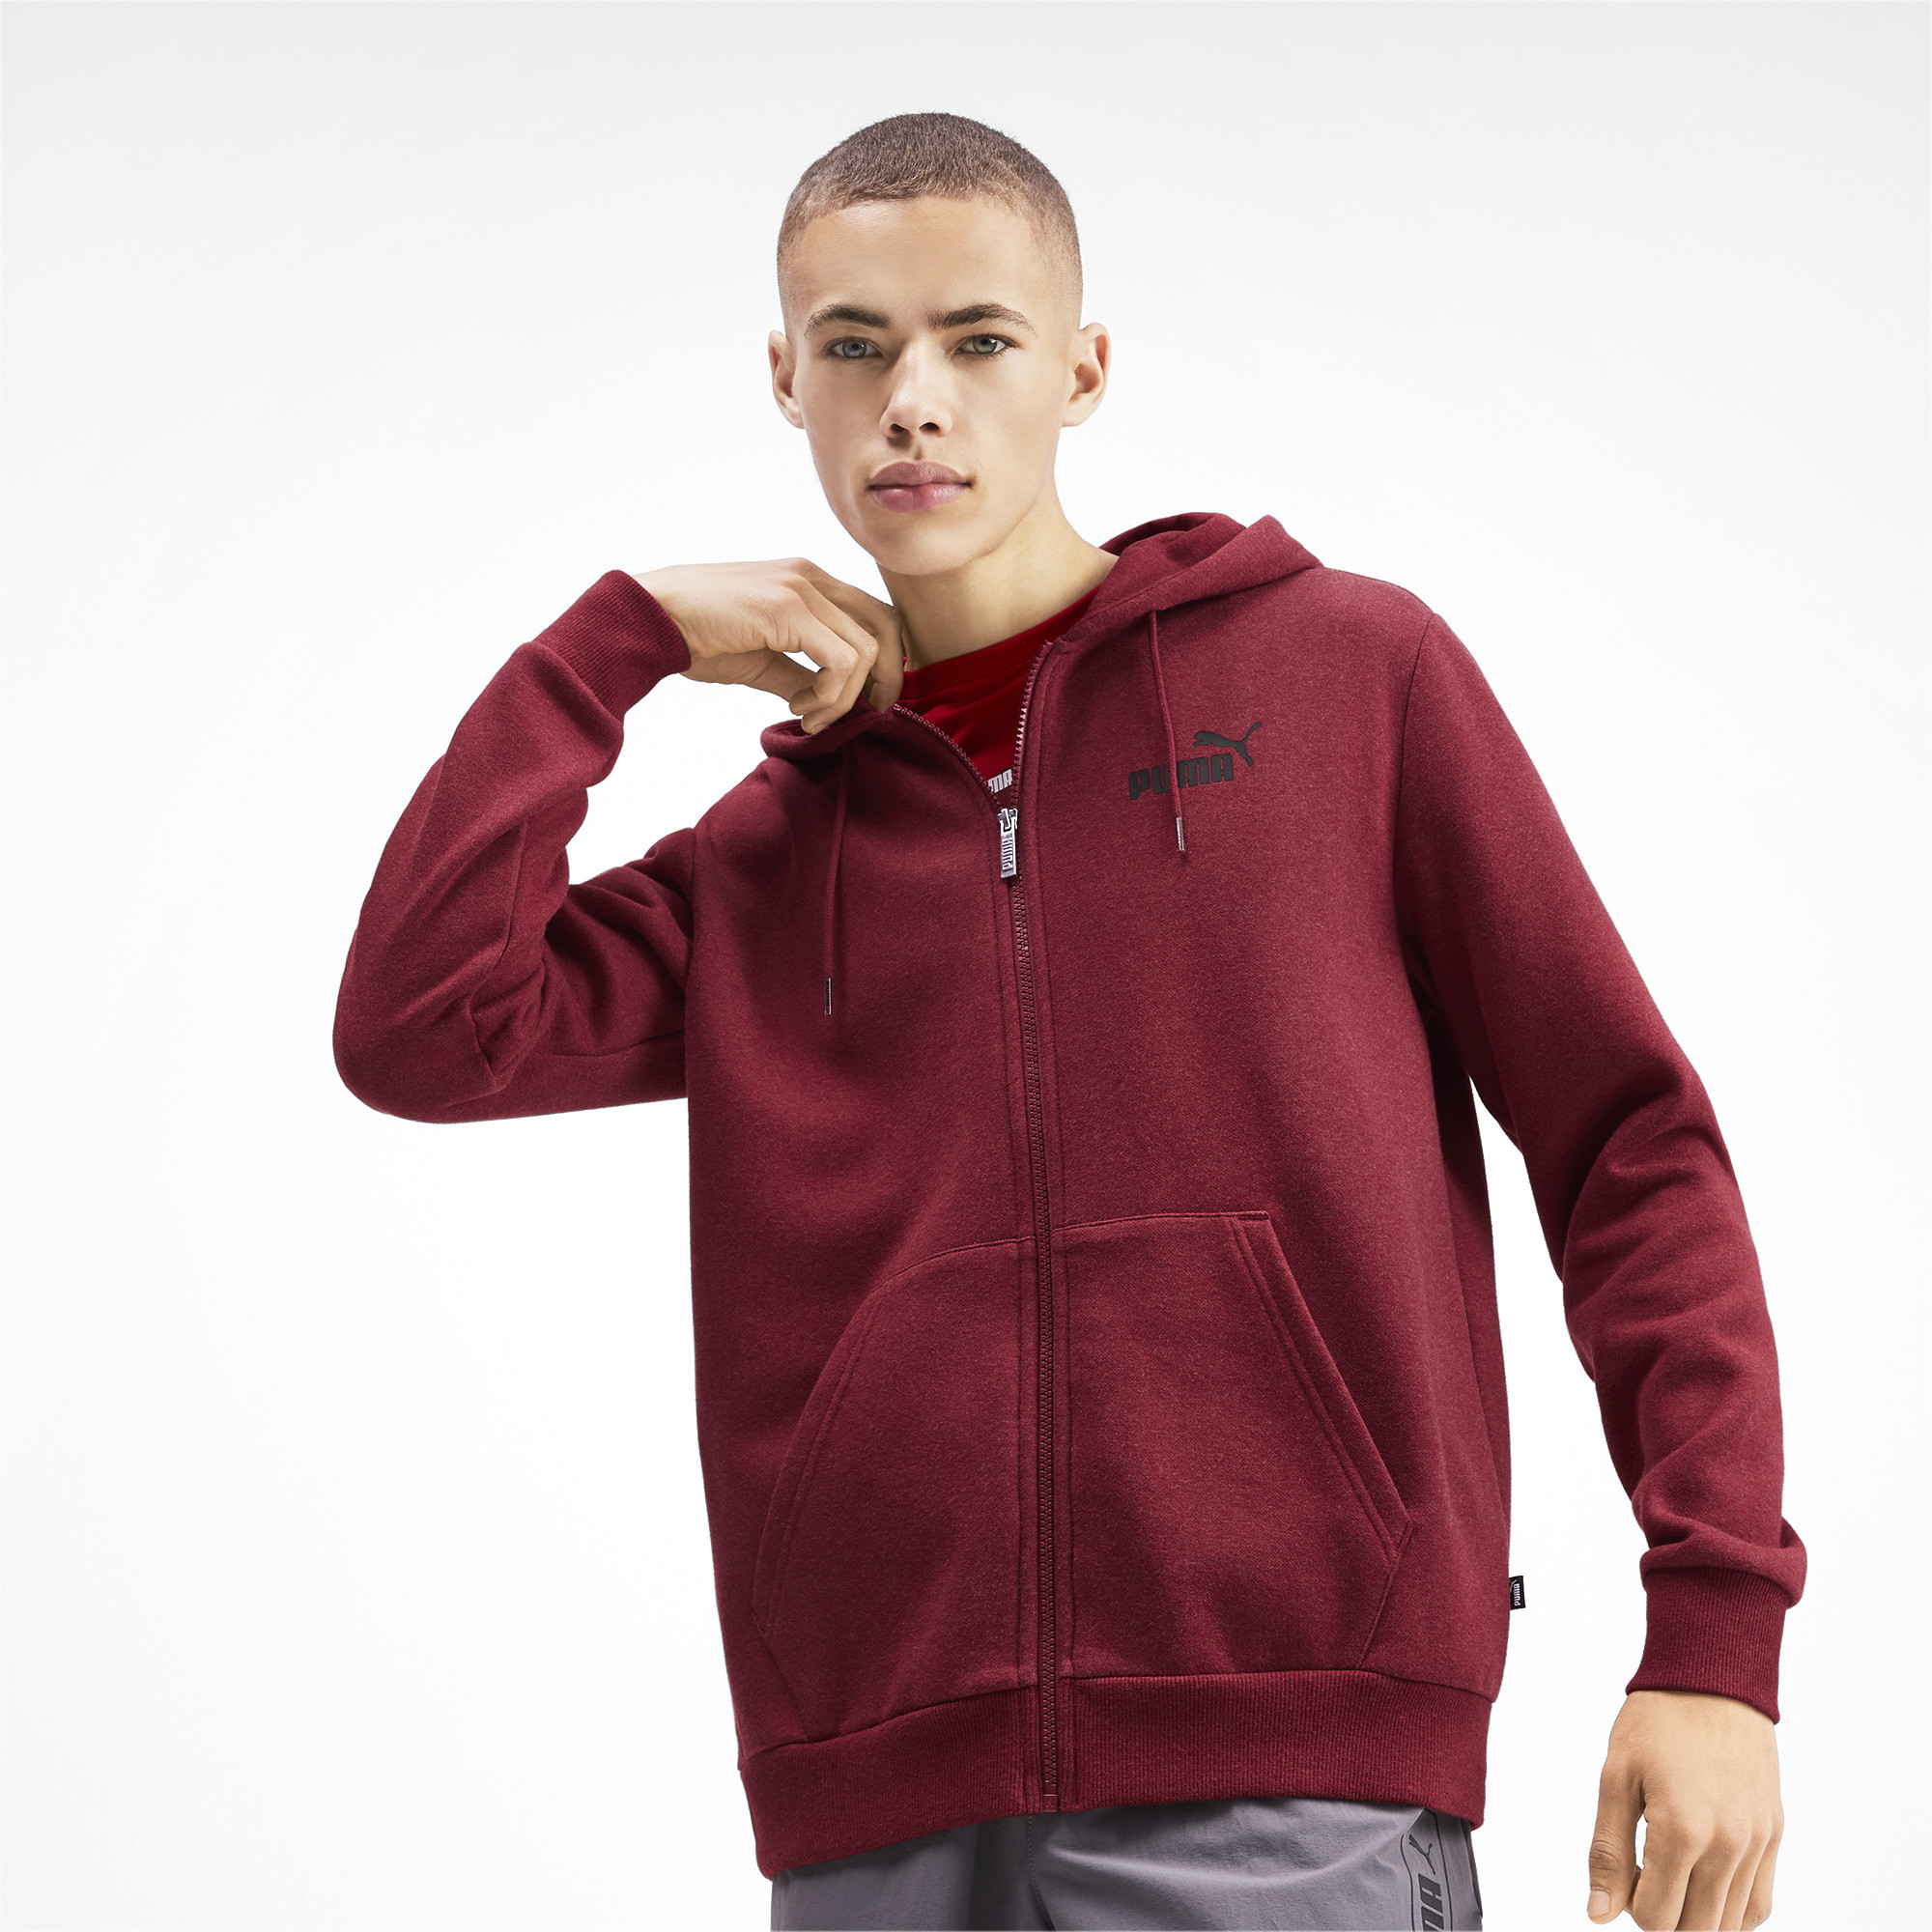 PUMA-Essentials-Men-039-s-Fleece-Hooded-Jacket-Men-Sweat-Basics thumbnail 8